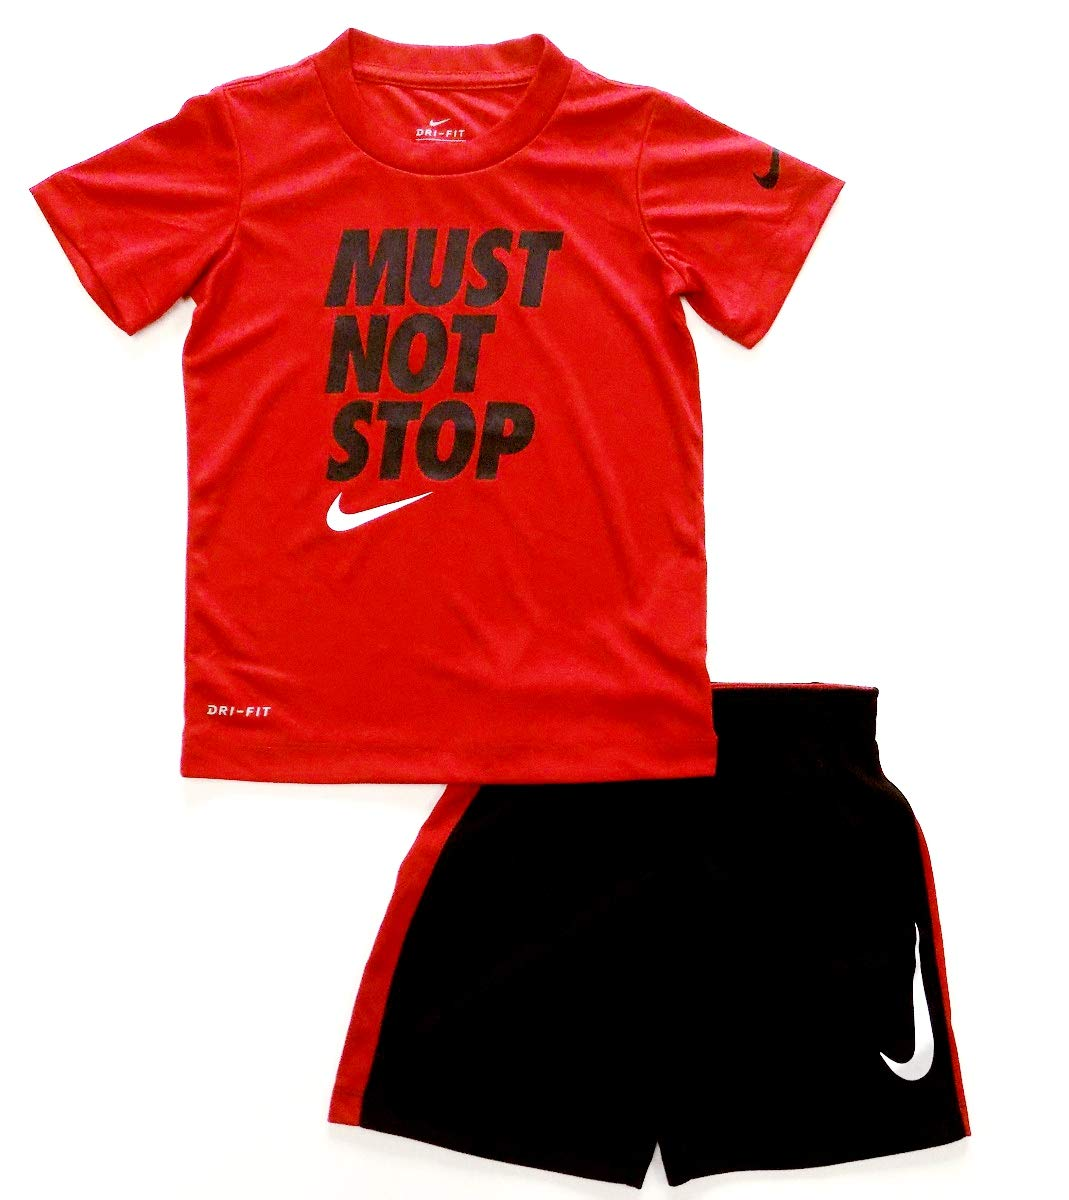 Nike Toddler Boys Must Not Stop Short Set - Red/Black (4T)